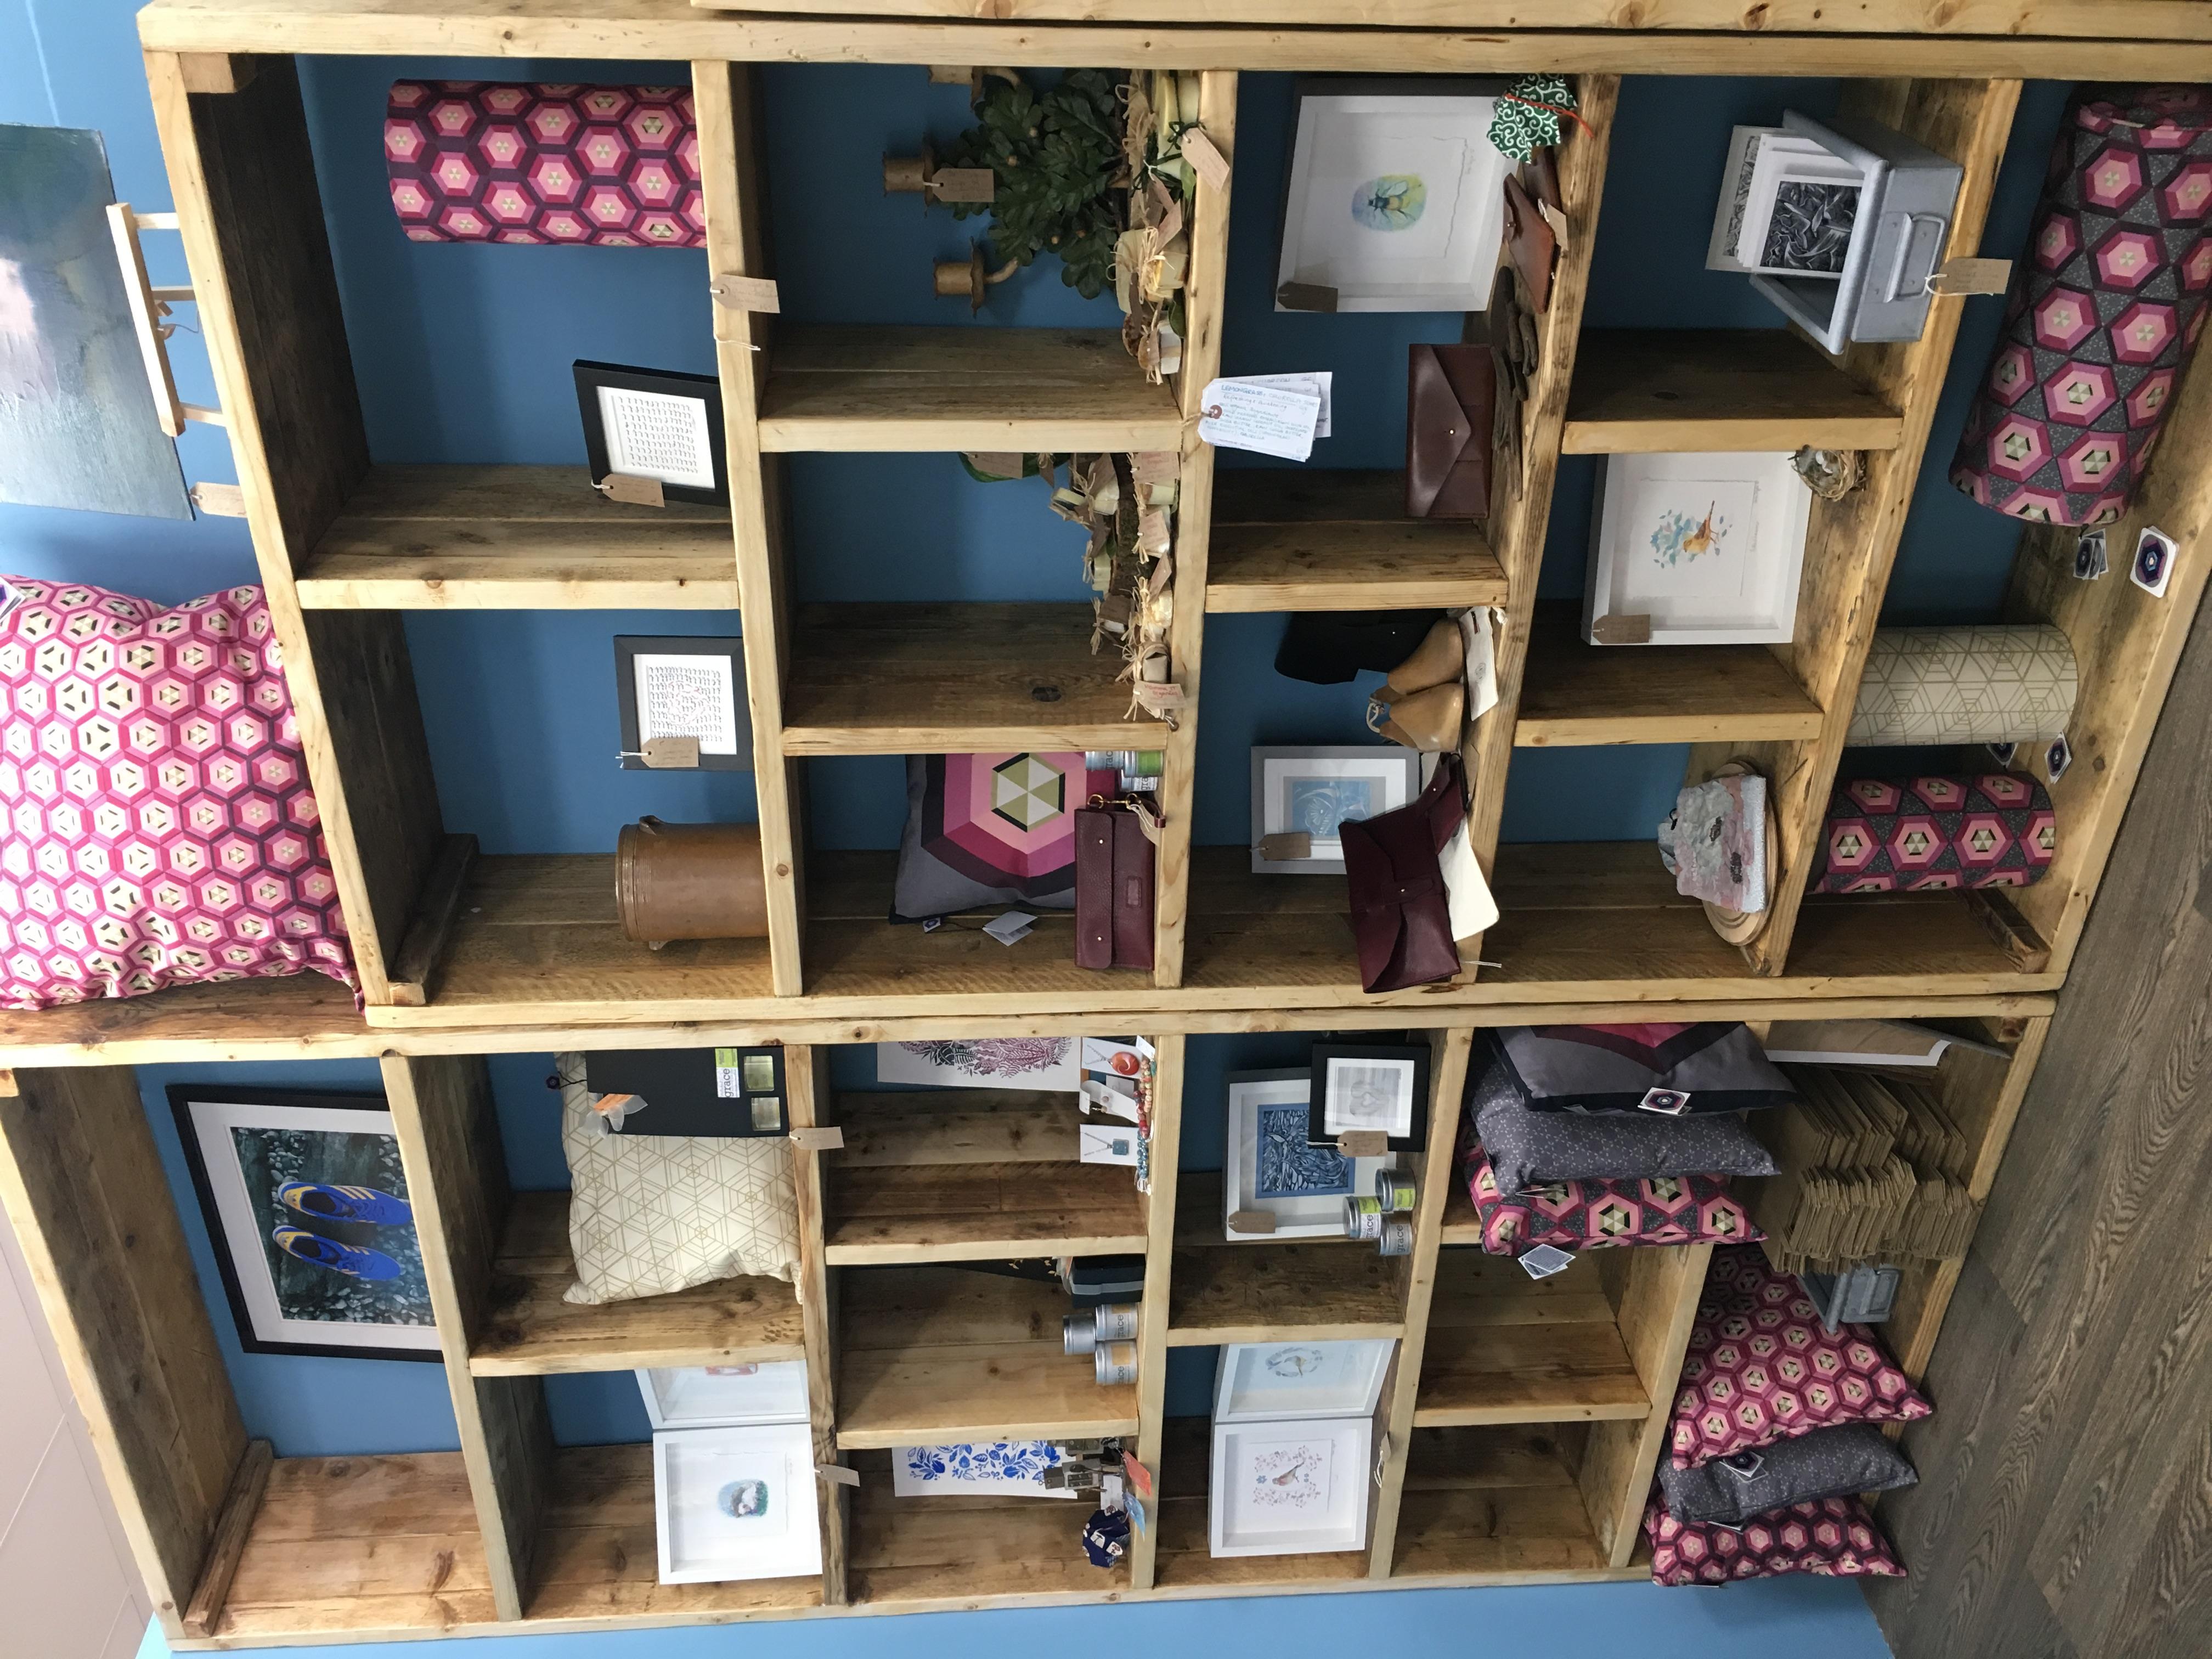 Reclaimed shelving unit